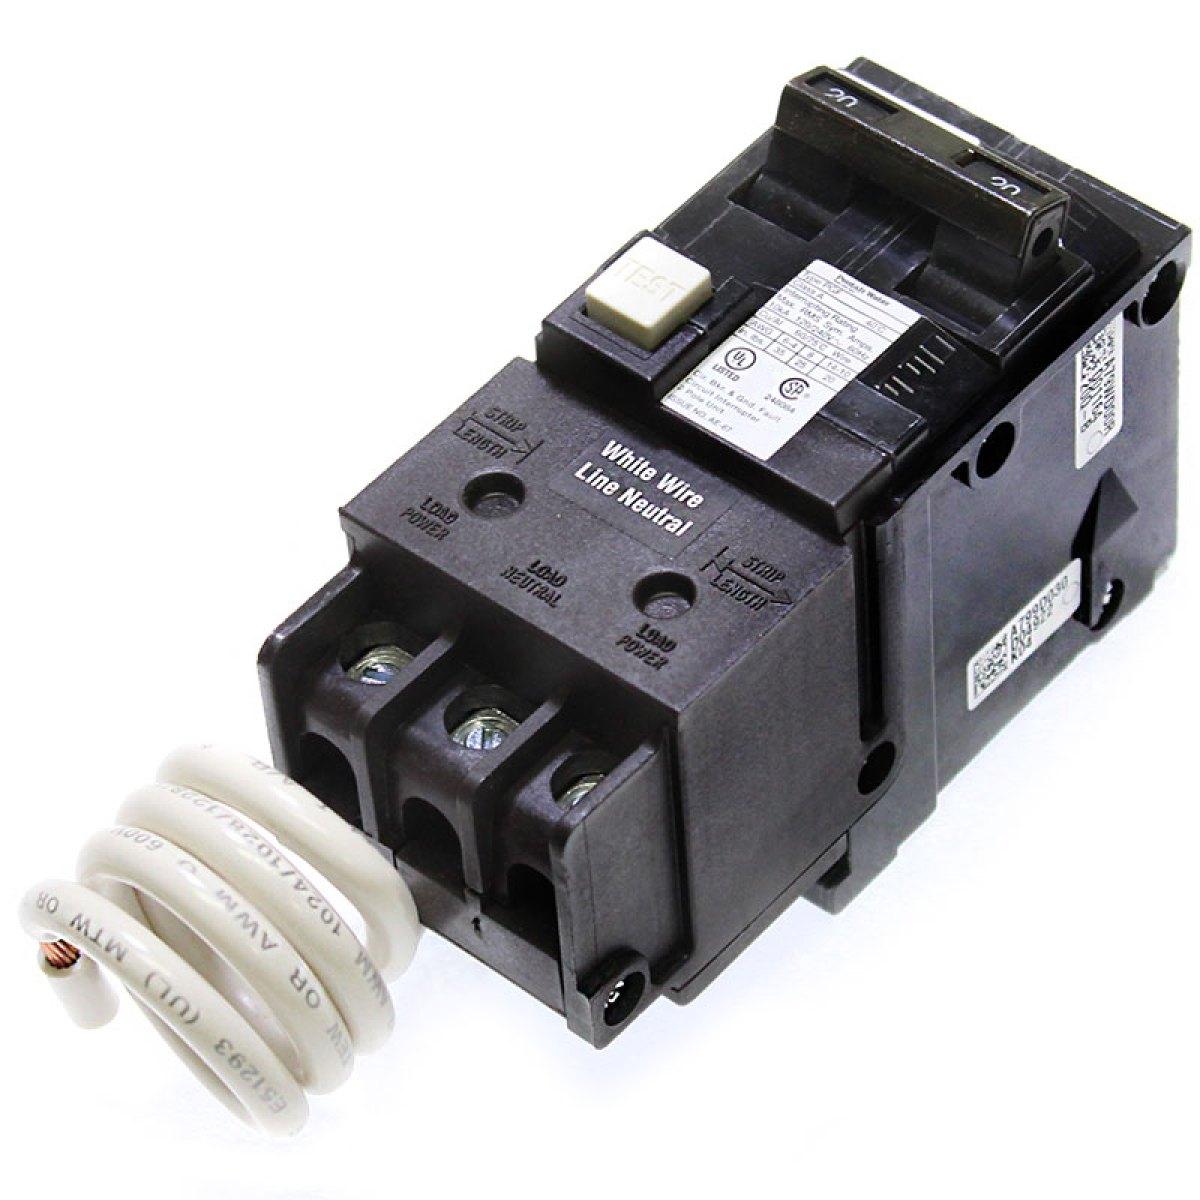 220 gfci wiring diagram pentair gfci breaker 2 pole 20 amp pa220gf free shipping  pentair gfci breaker 2 pole 20 amp